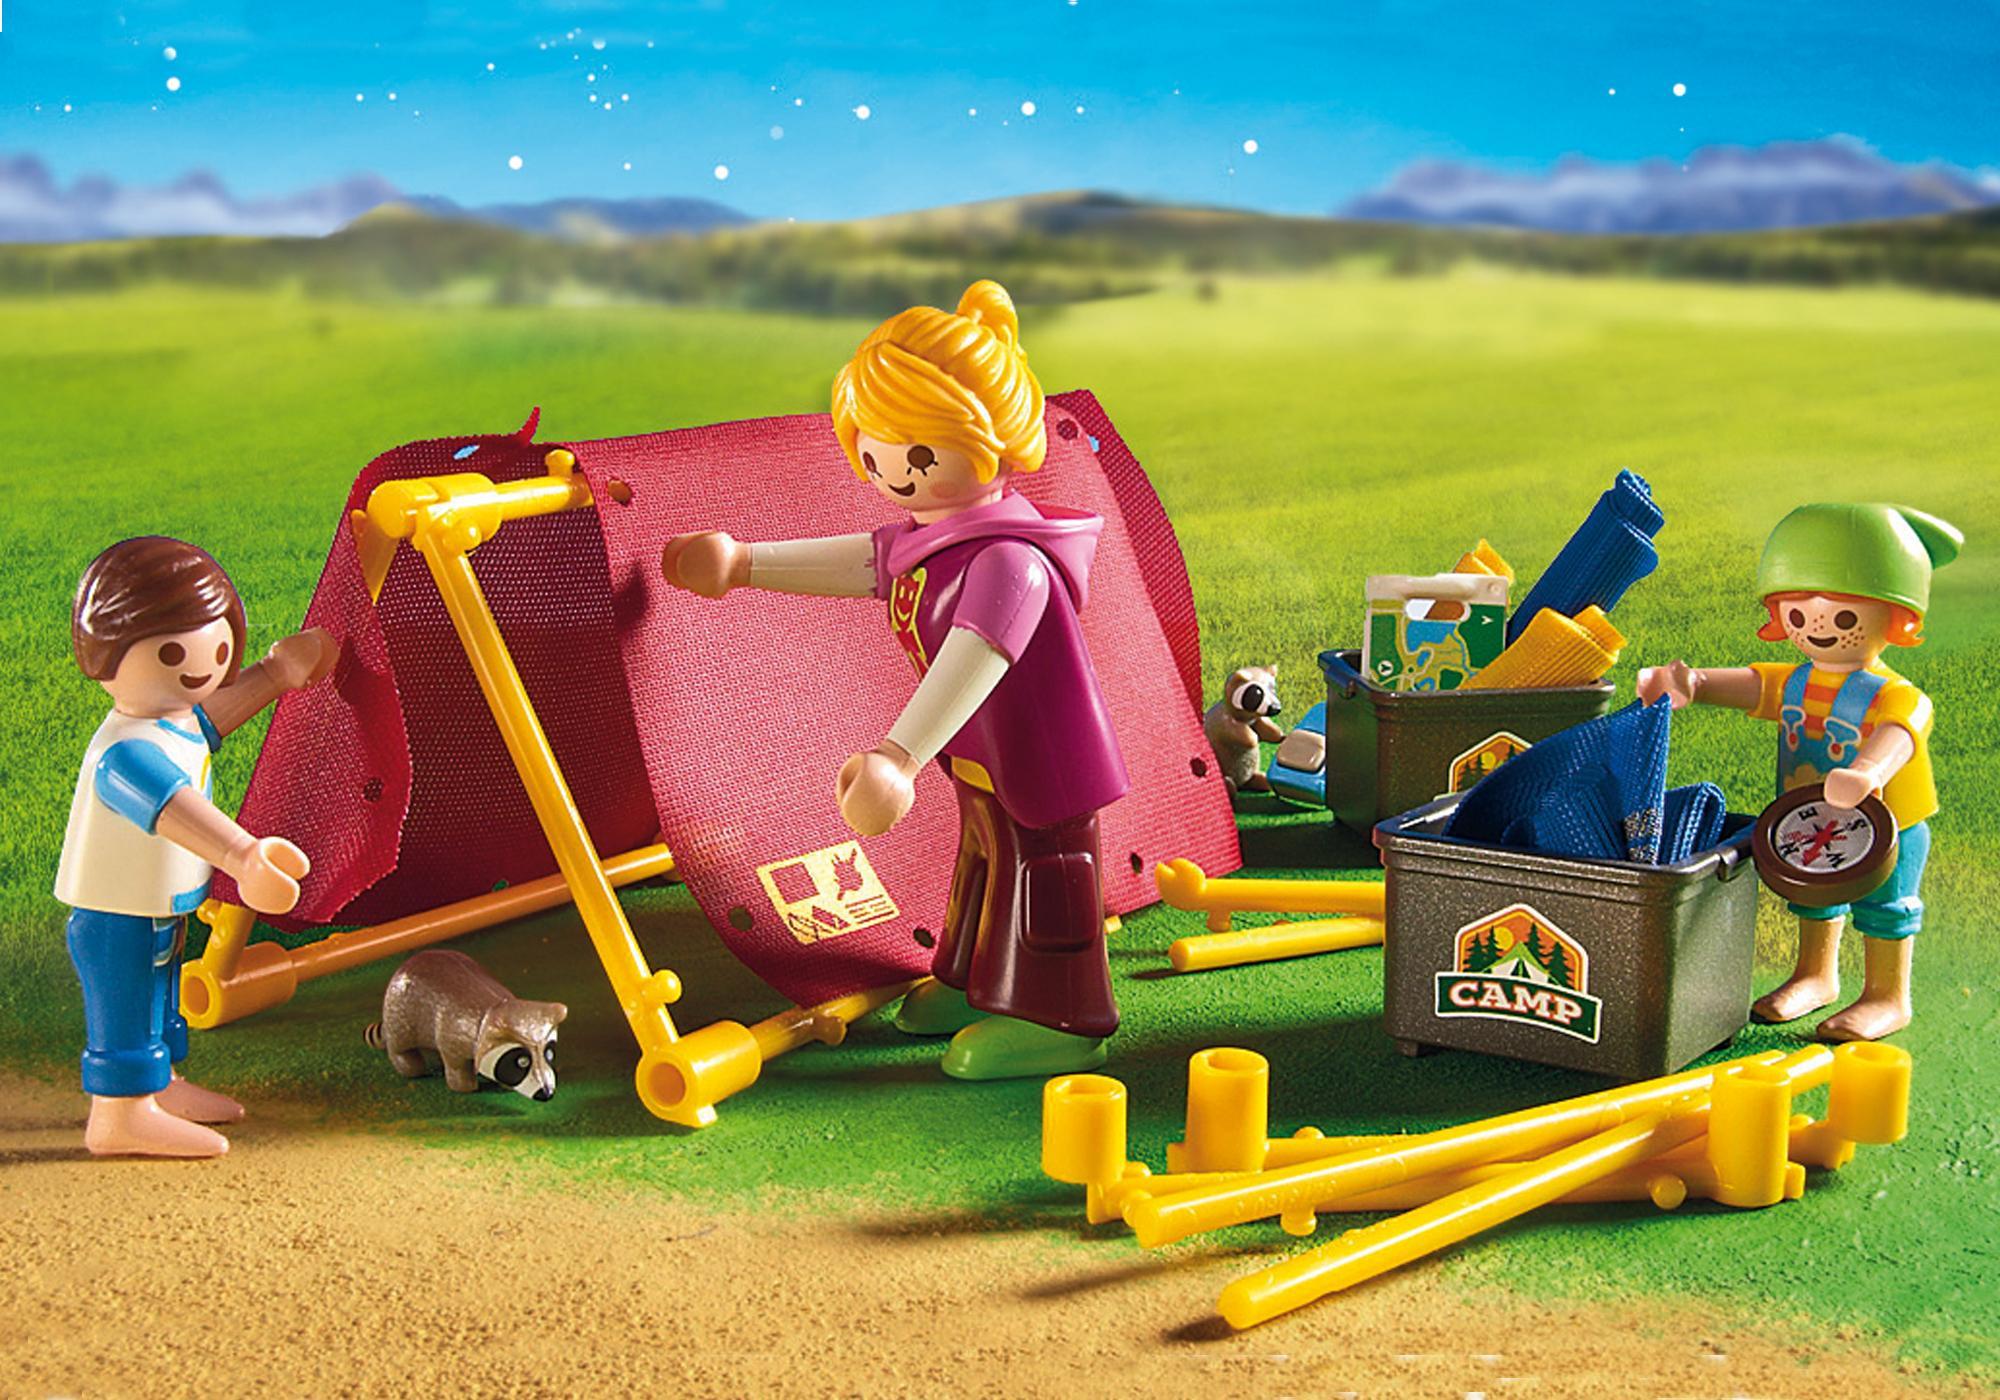 http://media.playmobil.com/i/playmobil/6888_product_extra2